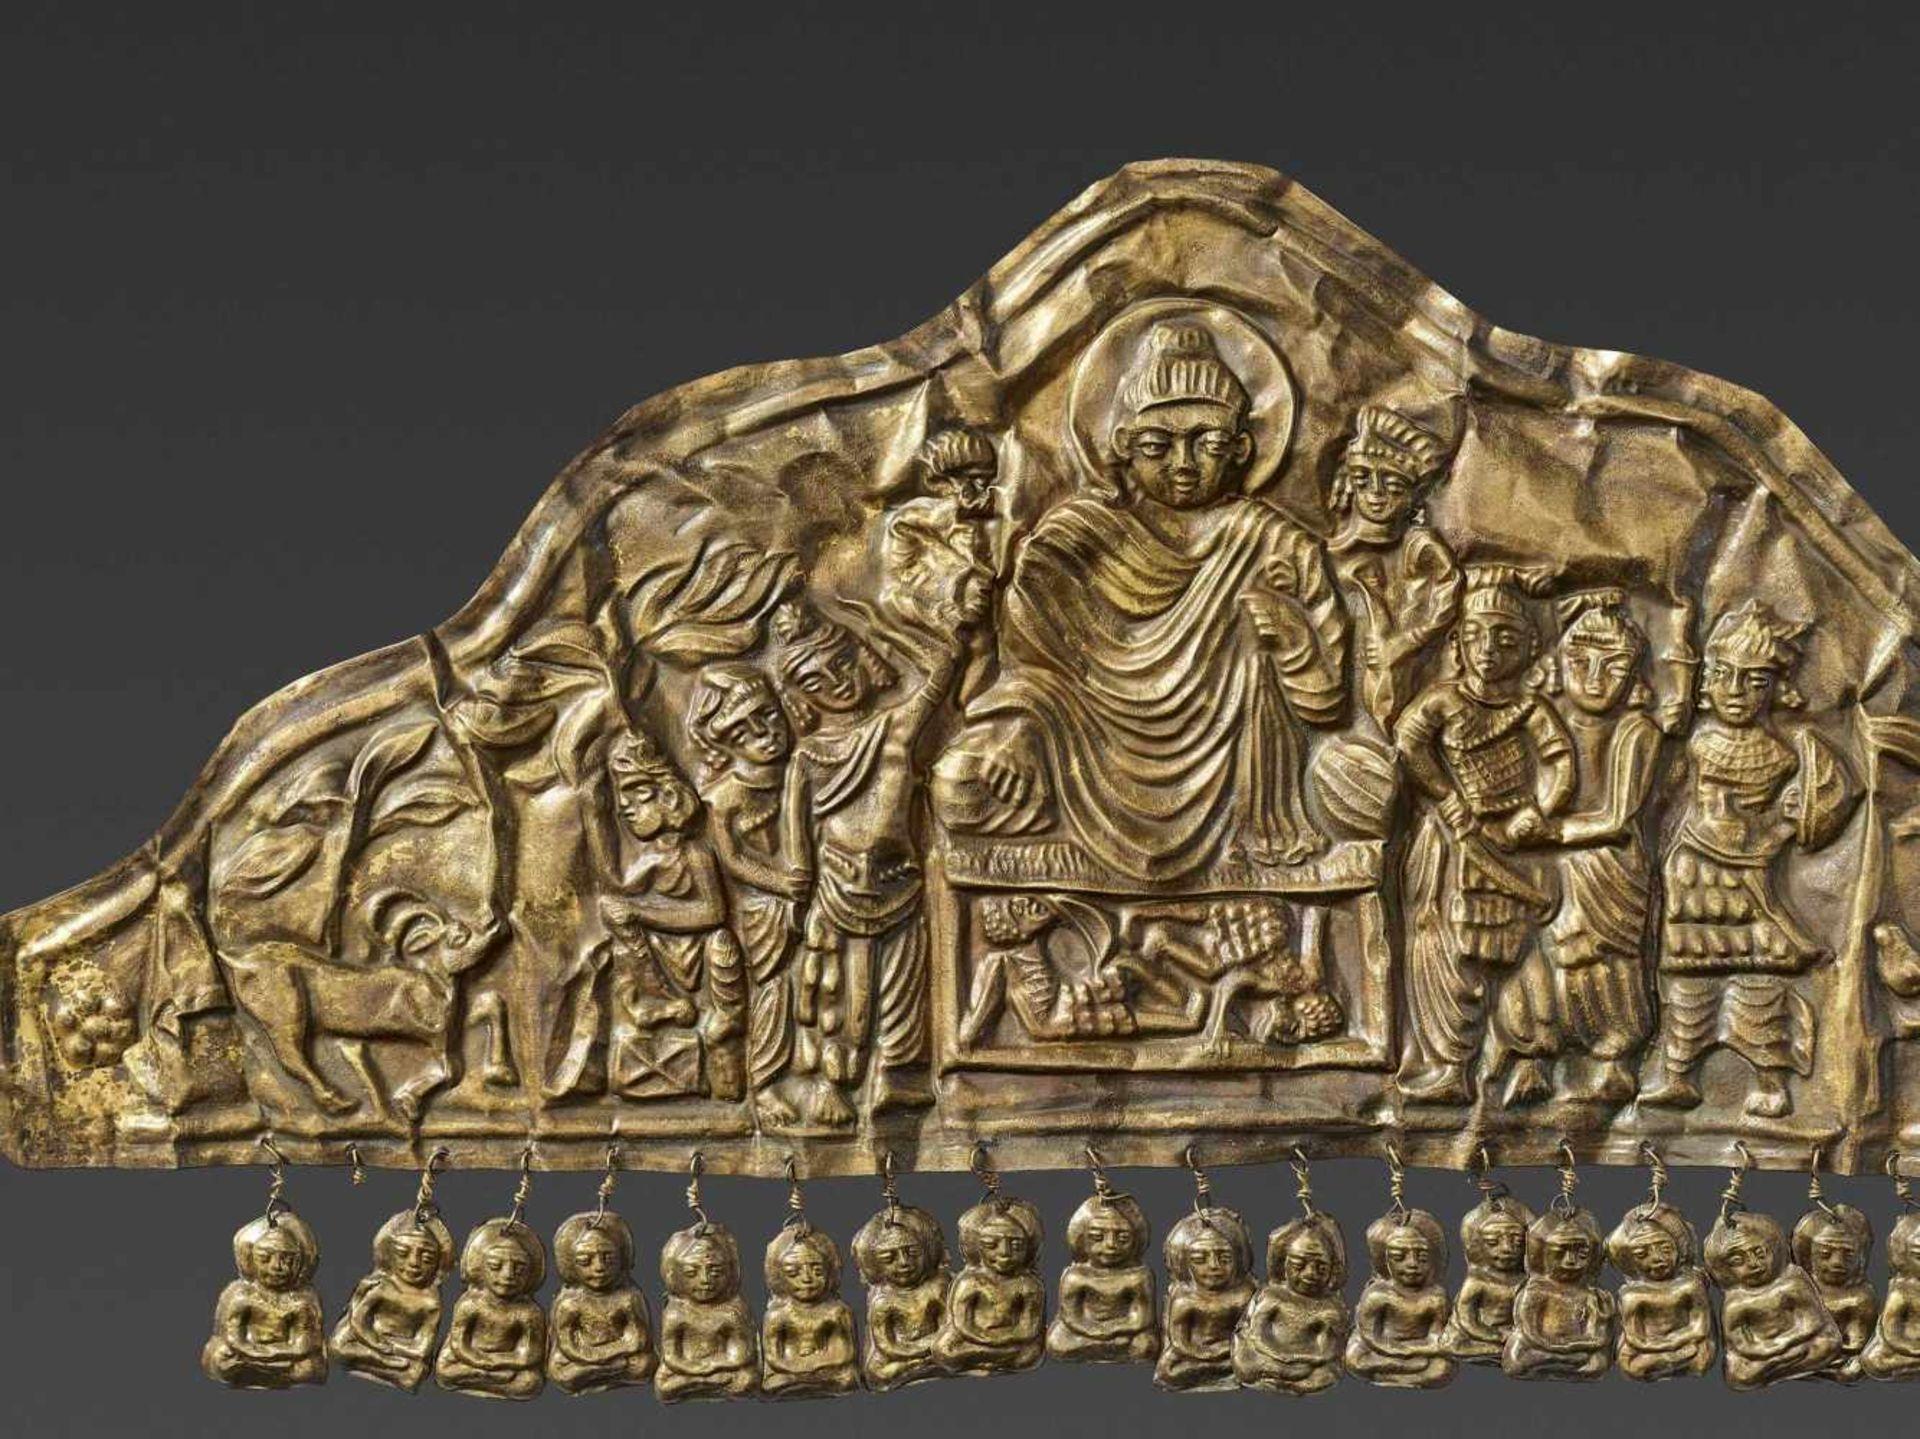 AN EXTREMELY RARE GANDHARAN GOLD DIADEM DEPICTING BUDDHA DEFYING MARA - Bild 3 aus 4